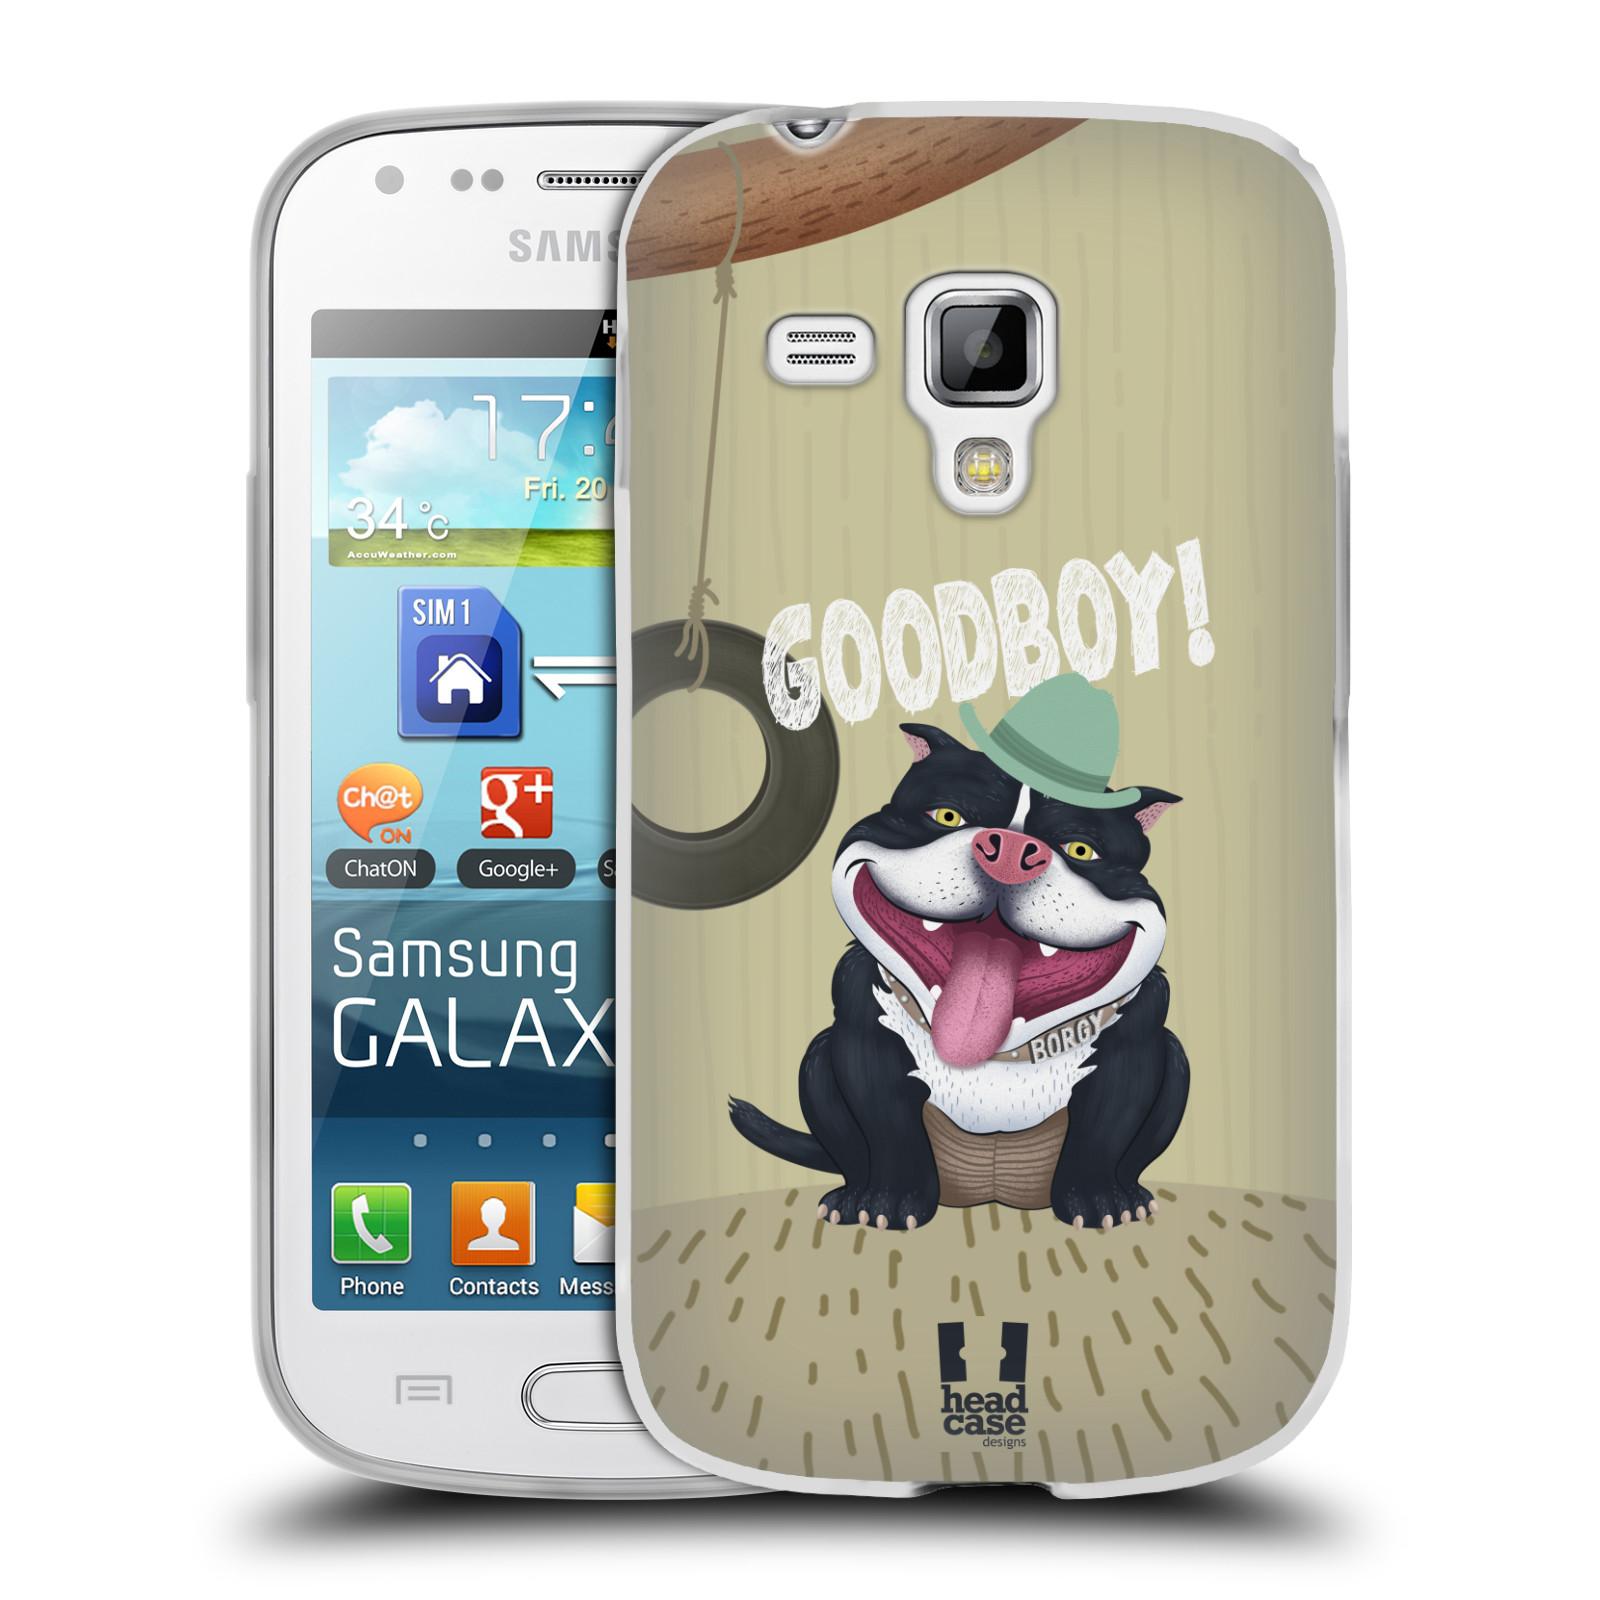 Silikonové pouzdro na mobil Samsung Galaxy Trend Plus HEAD CASE Goodboy! Pejsek (Silikonový kryt či obal na mobilní telefon Samsung Galaxy Trend Plus GT-S7580)